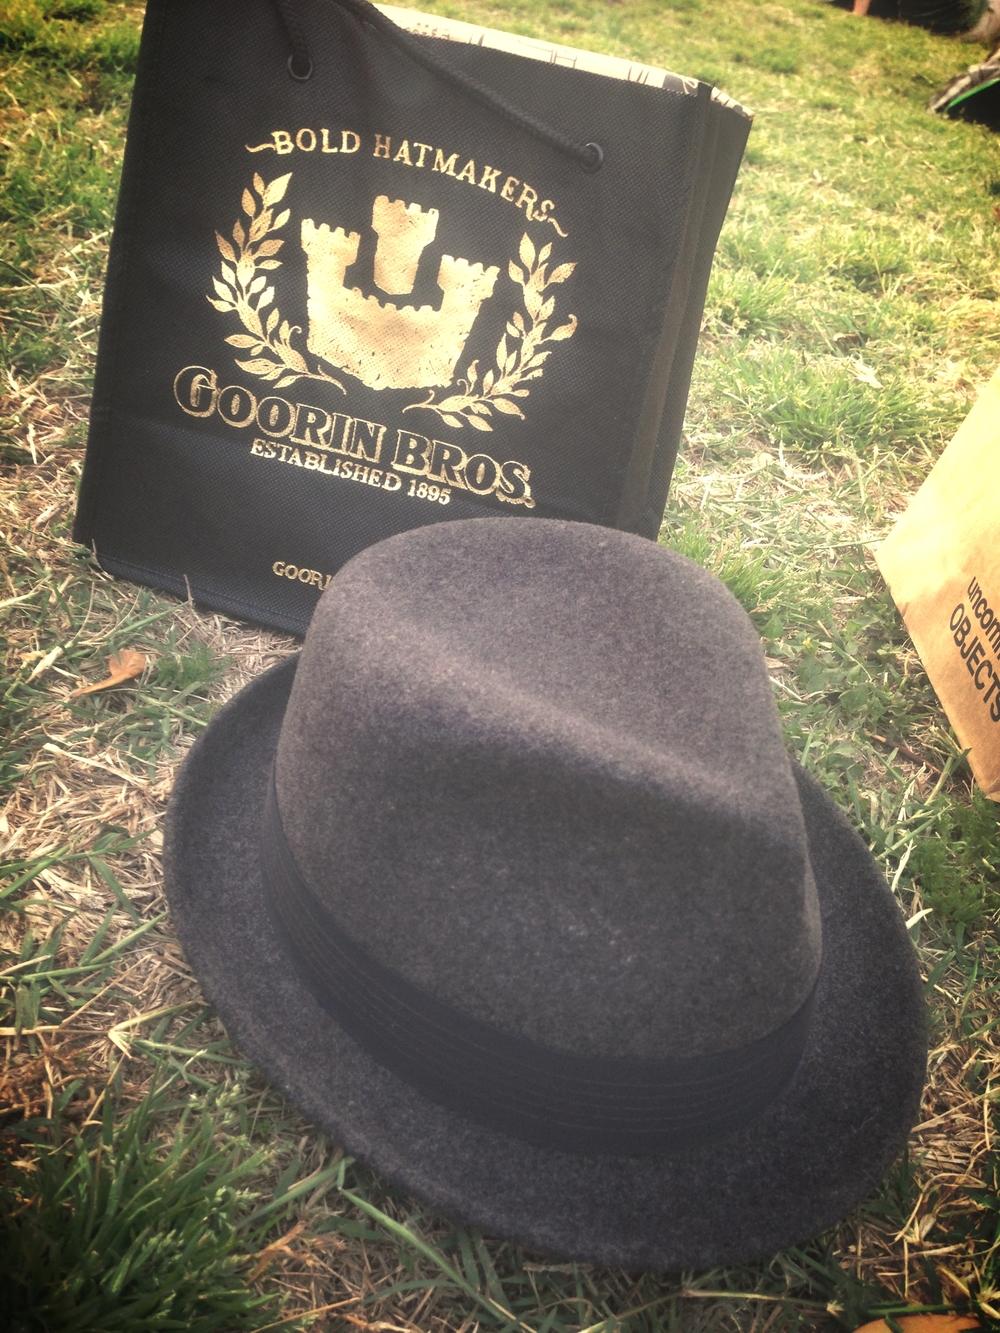 Hats from Goorin Bros.